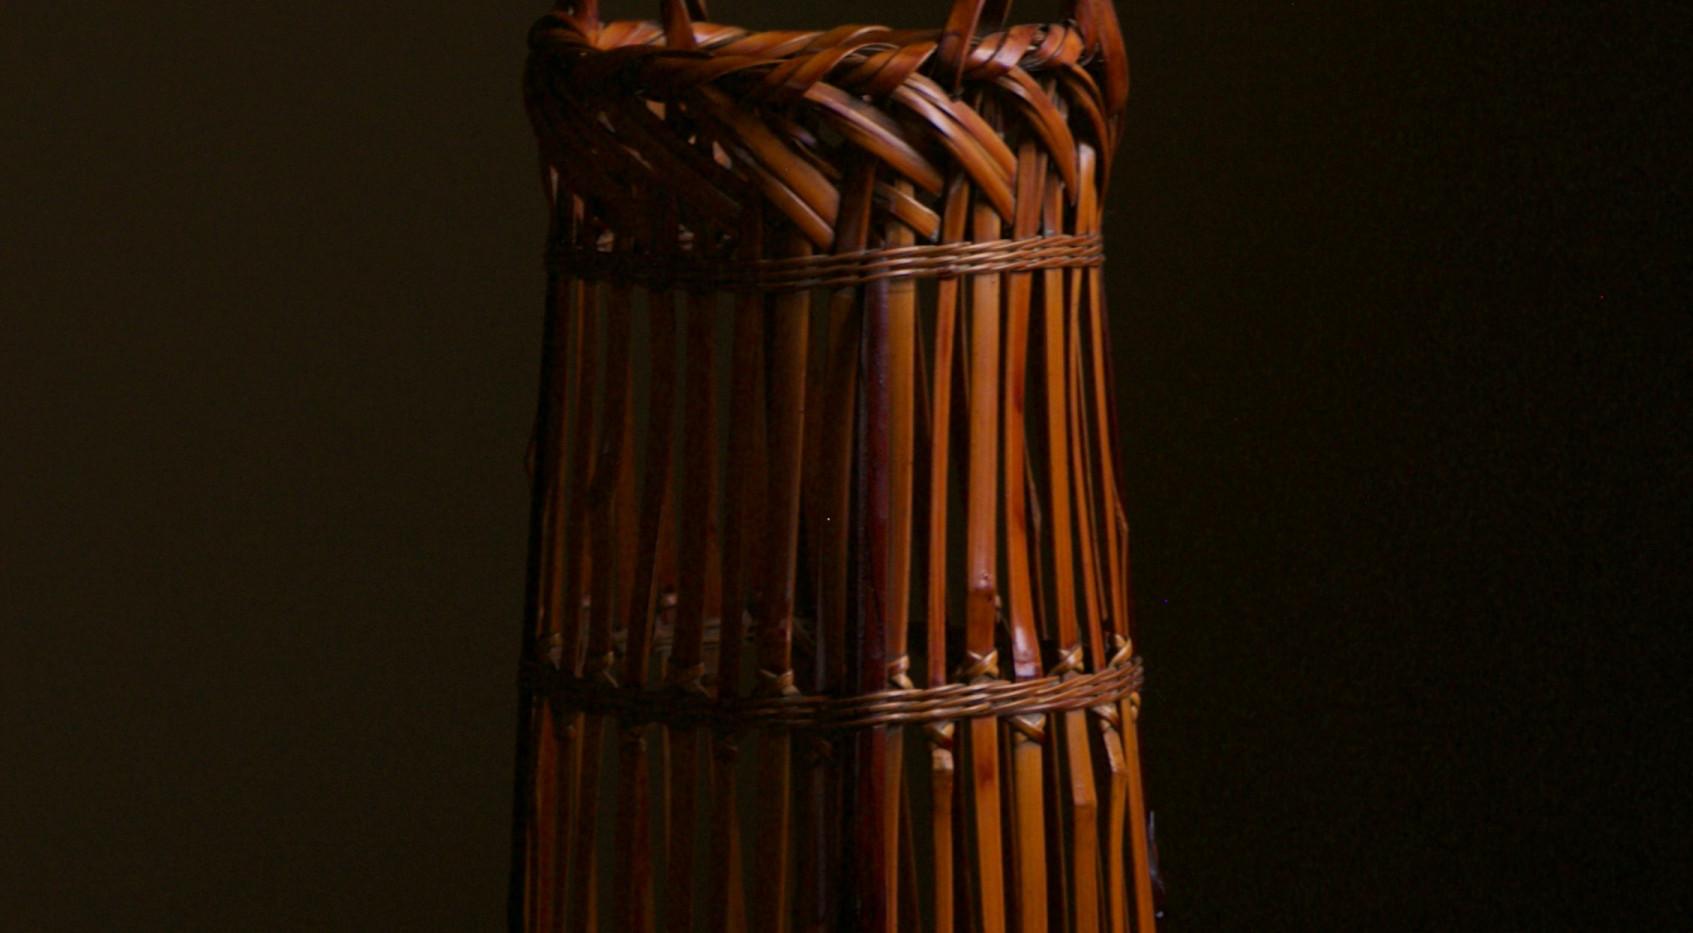 Tanabe Chikuunsai II Bamboo Fence 03.jpg